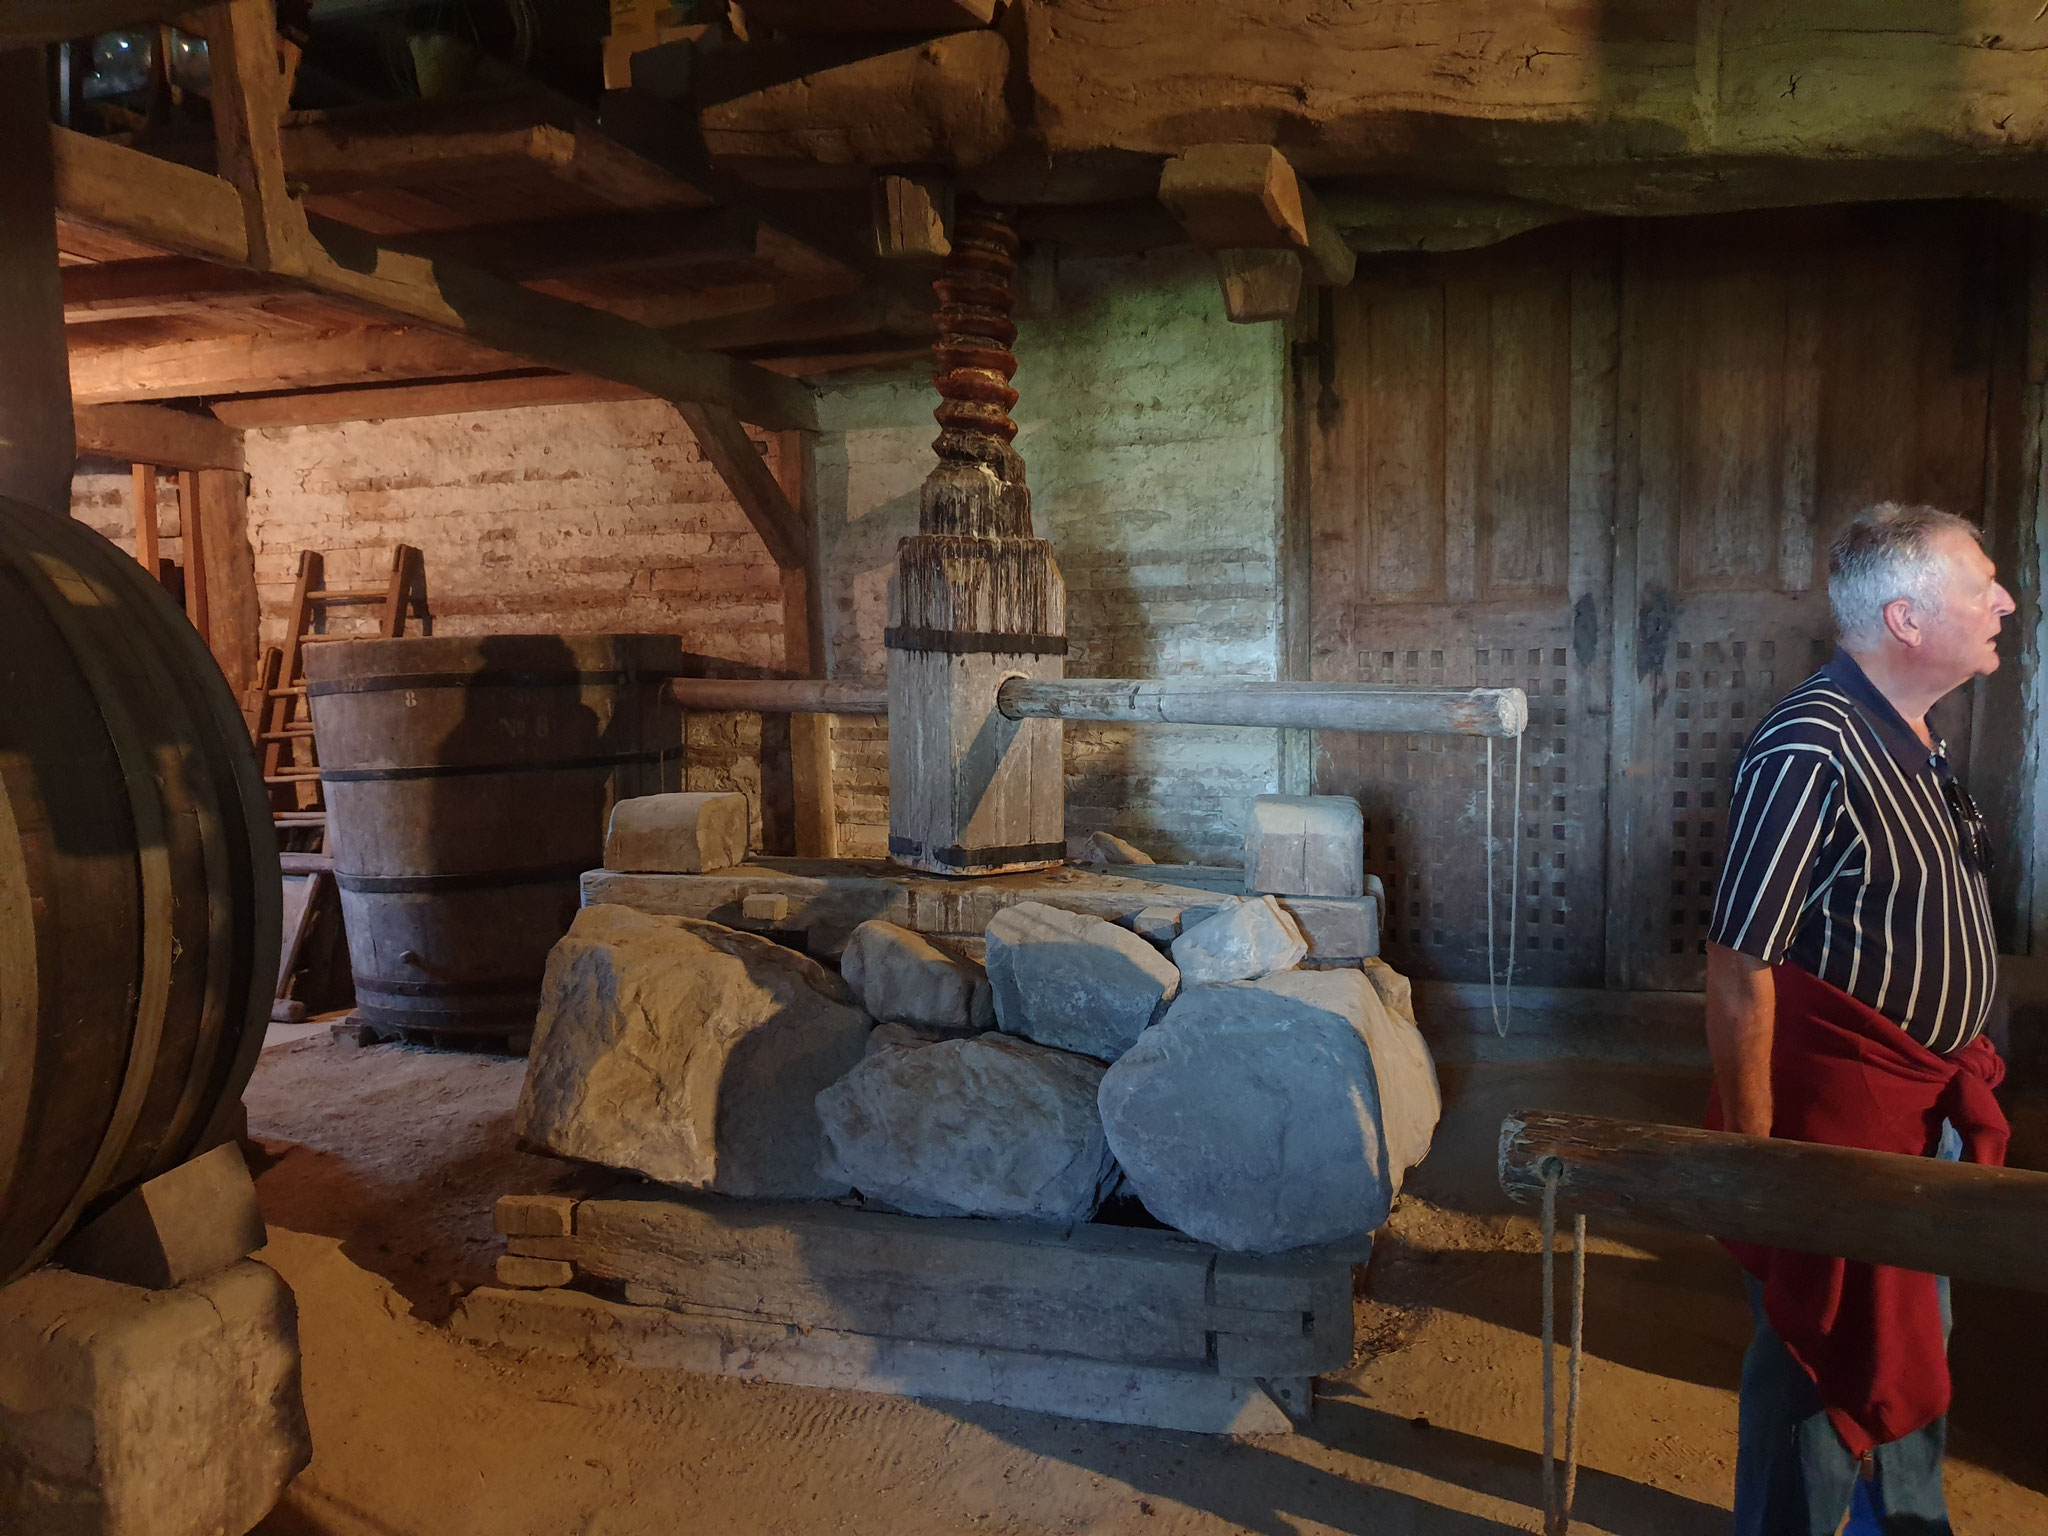 Torgel im Schloss Bachtobel